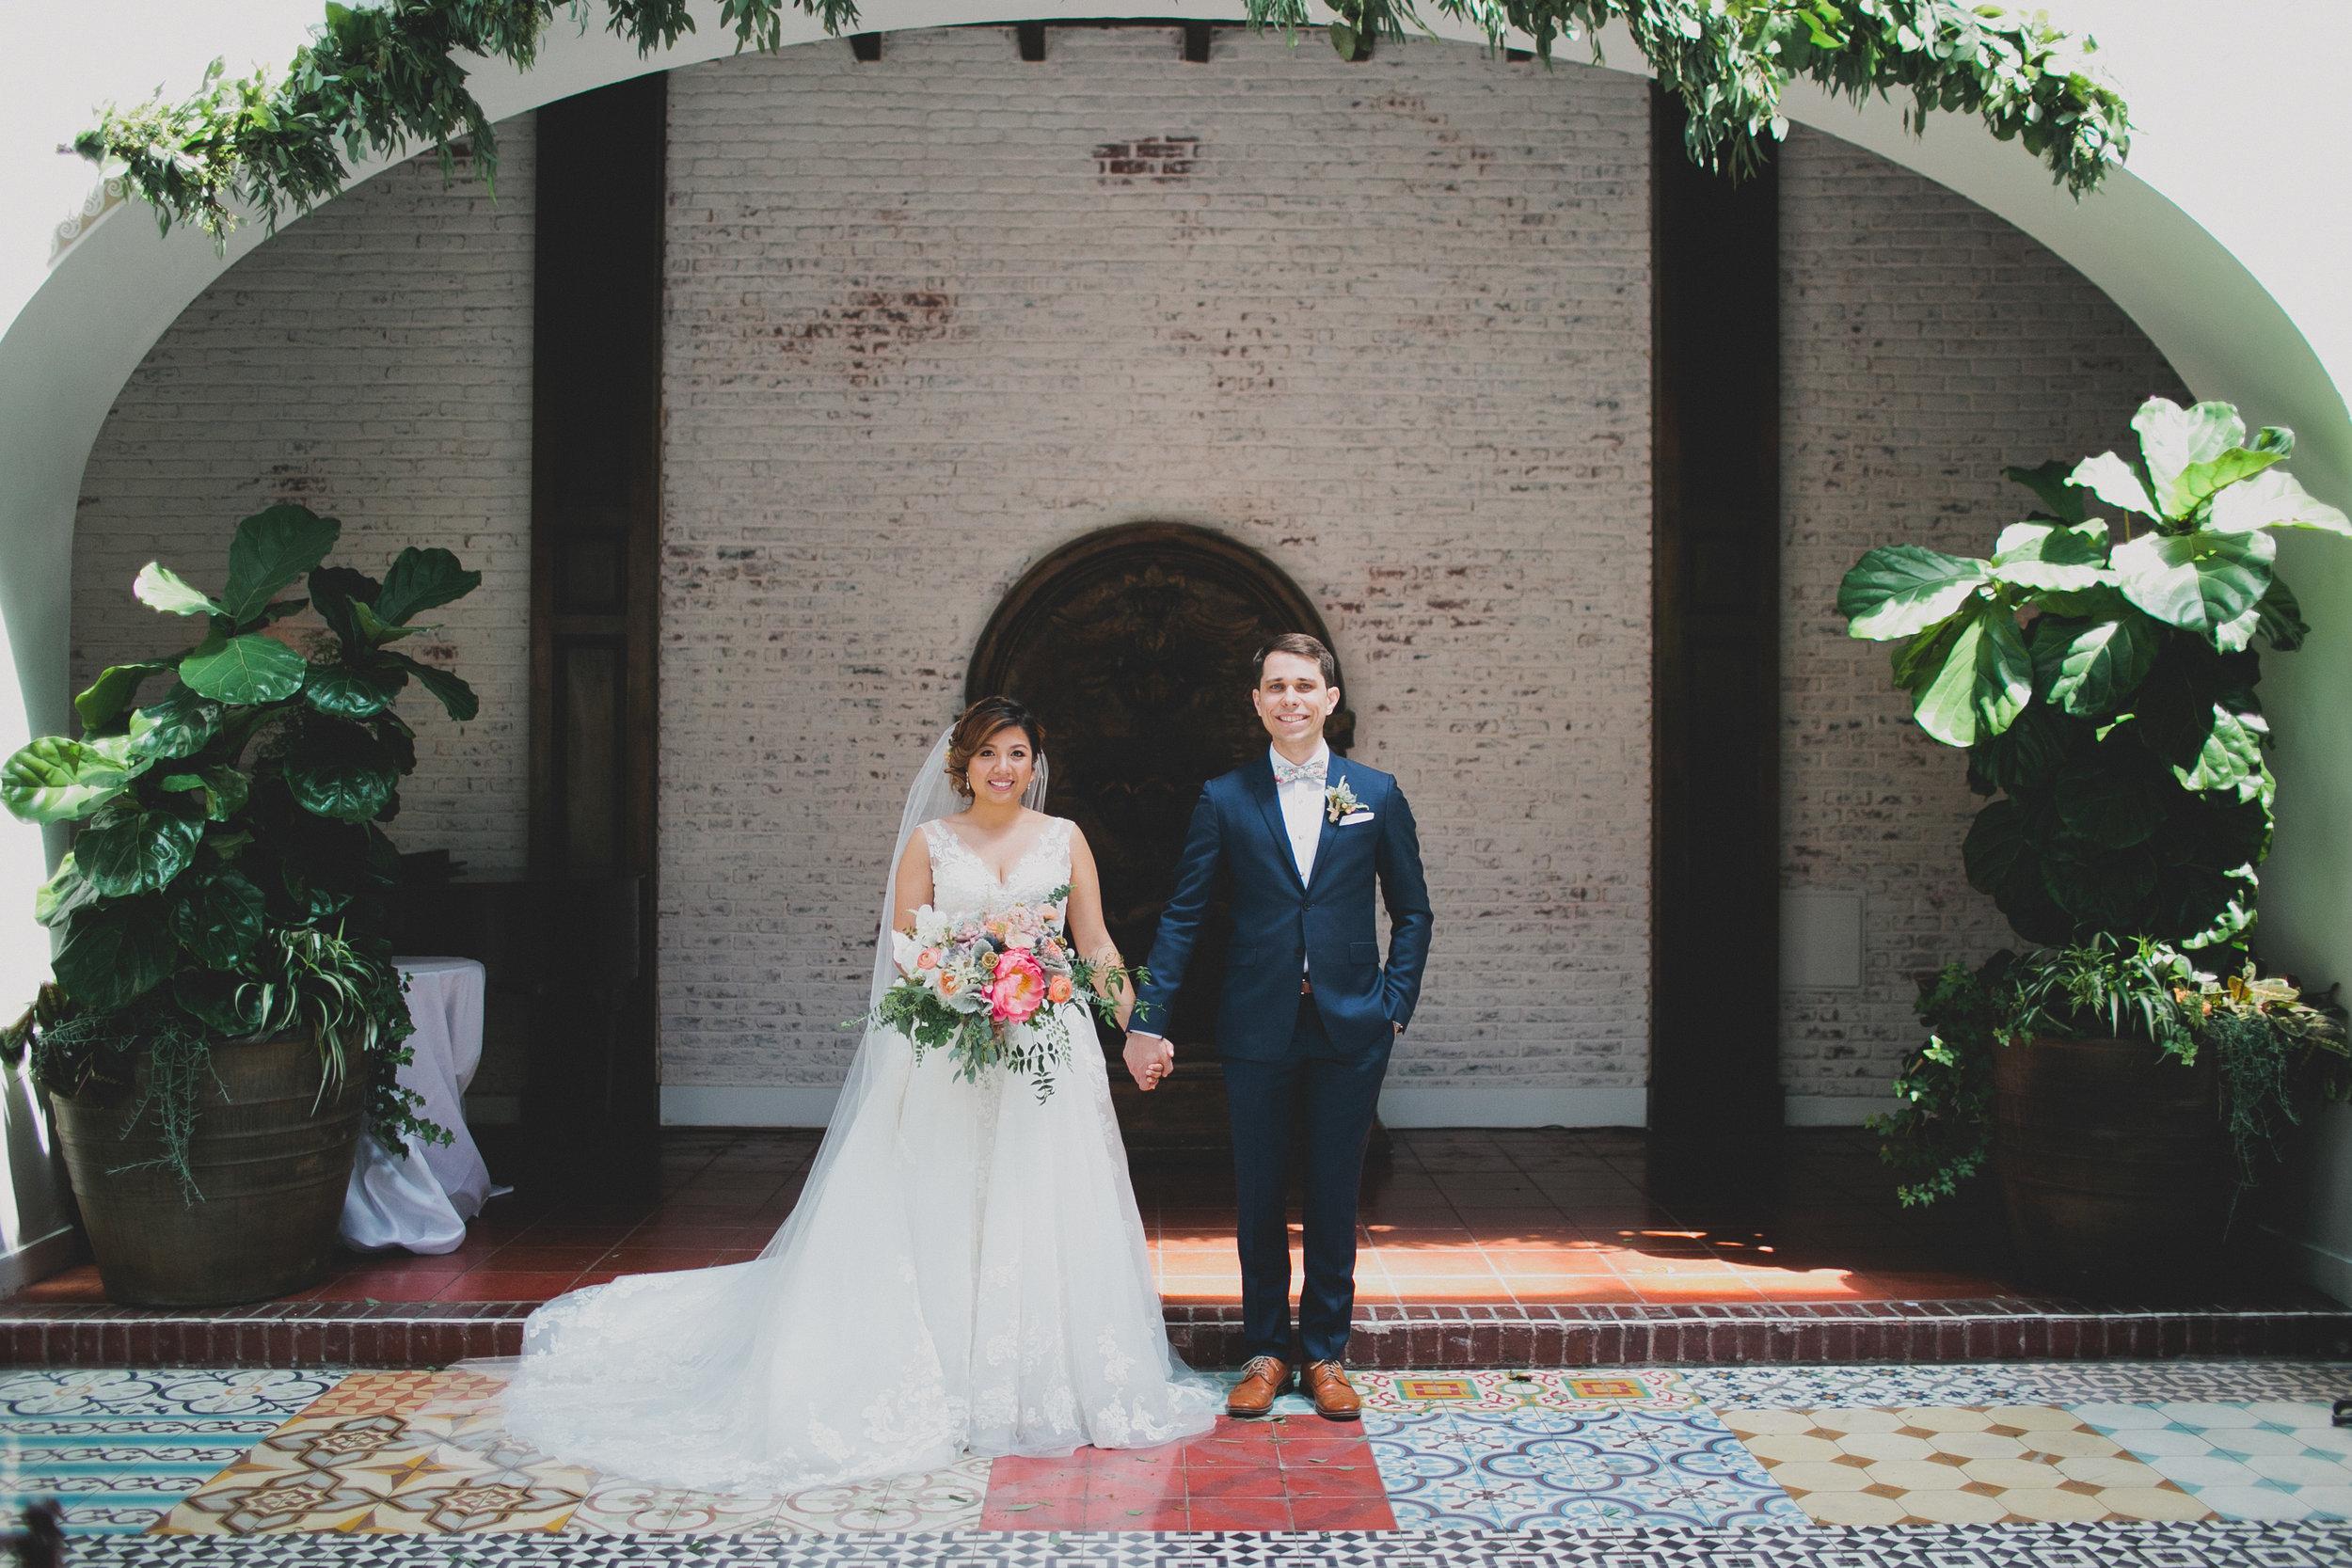 TiffanyAldis_Wedding_KatiePritchard-135.jpg